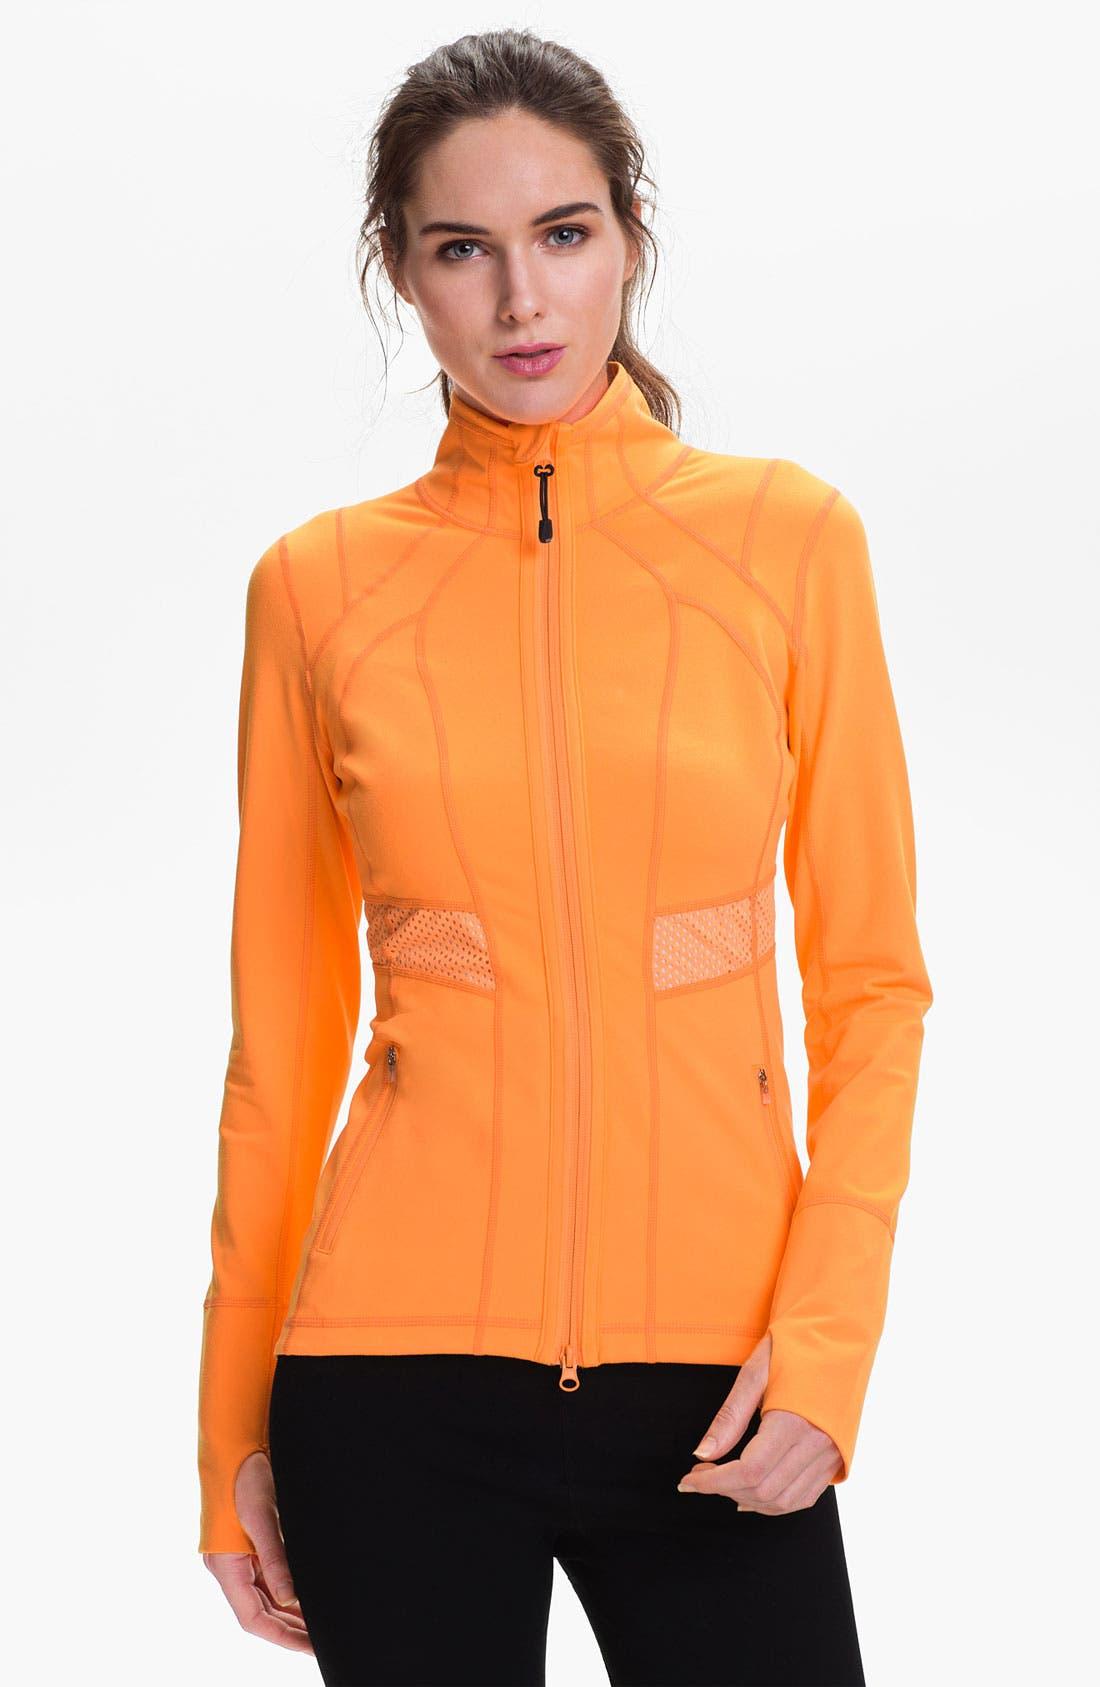 Main Image - Zella 'Victory' Jacket